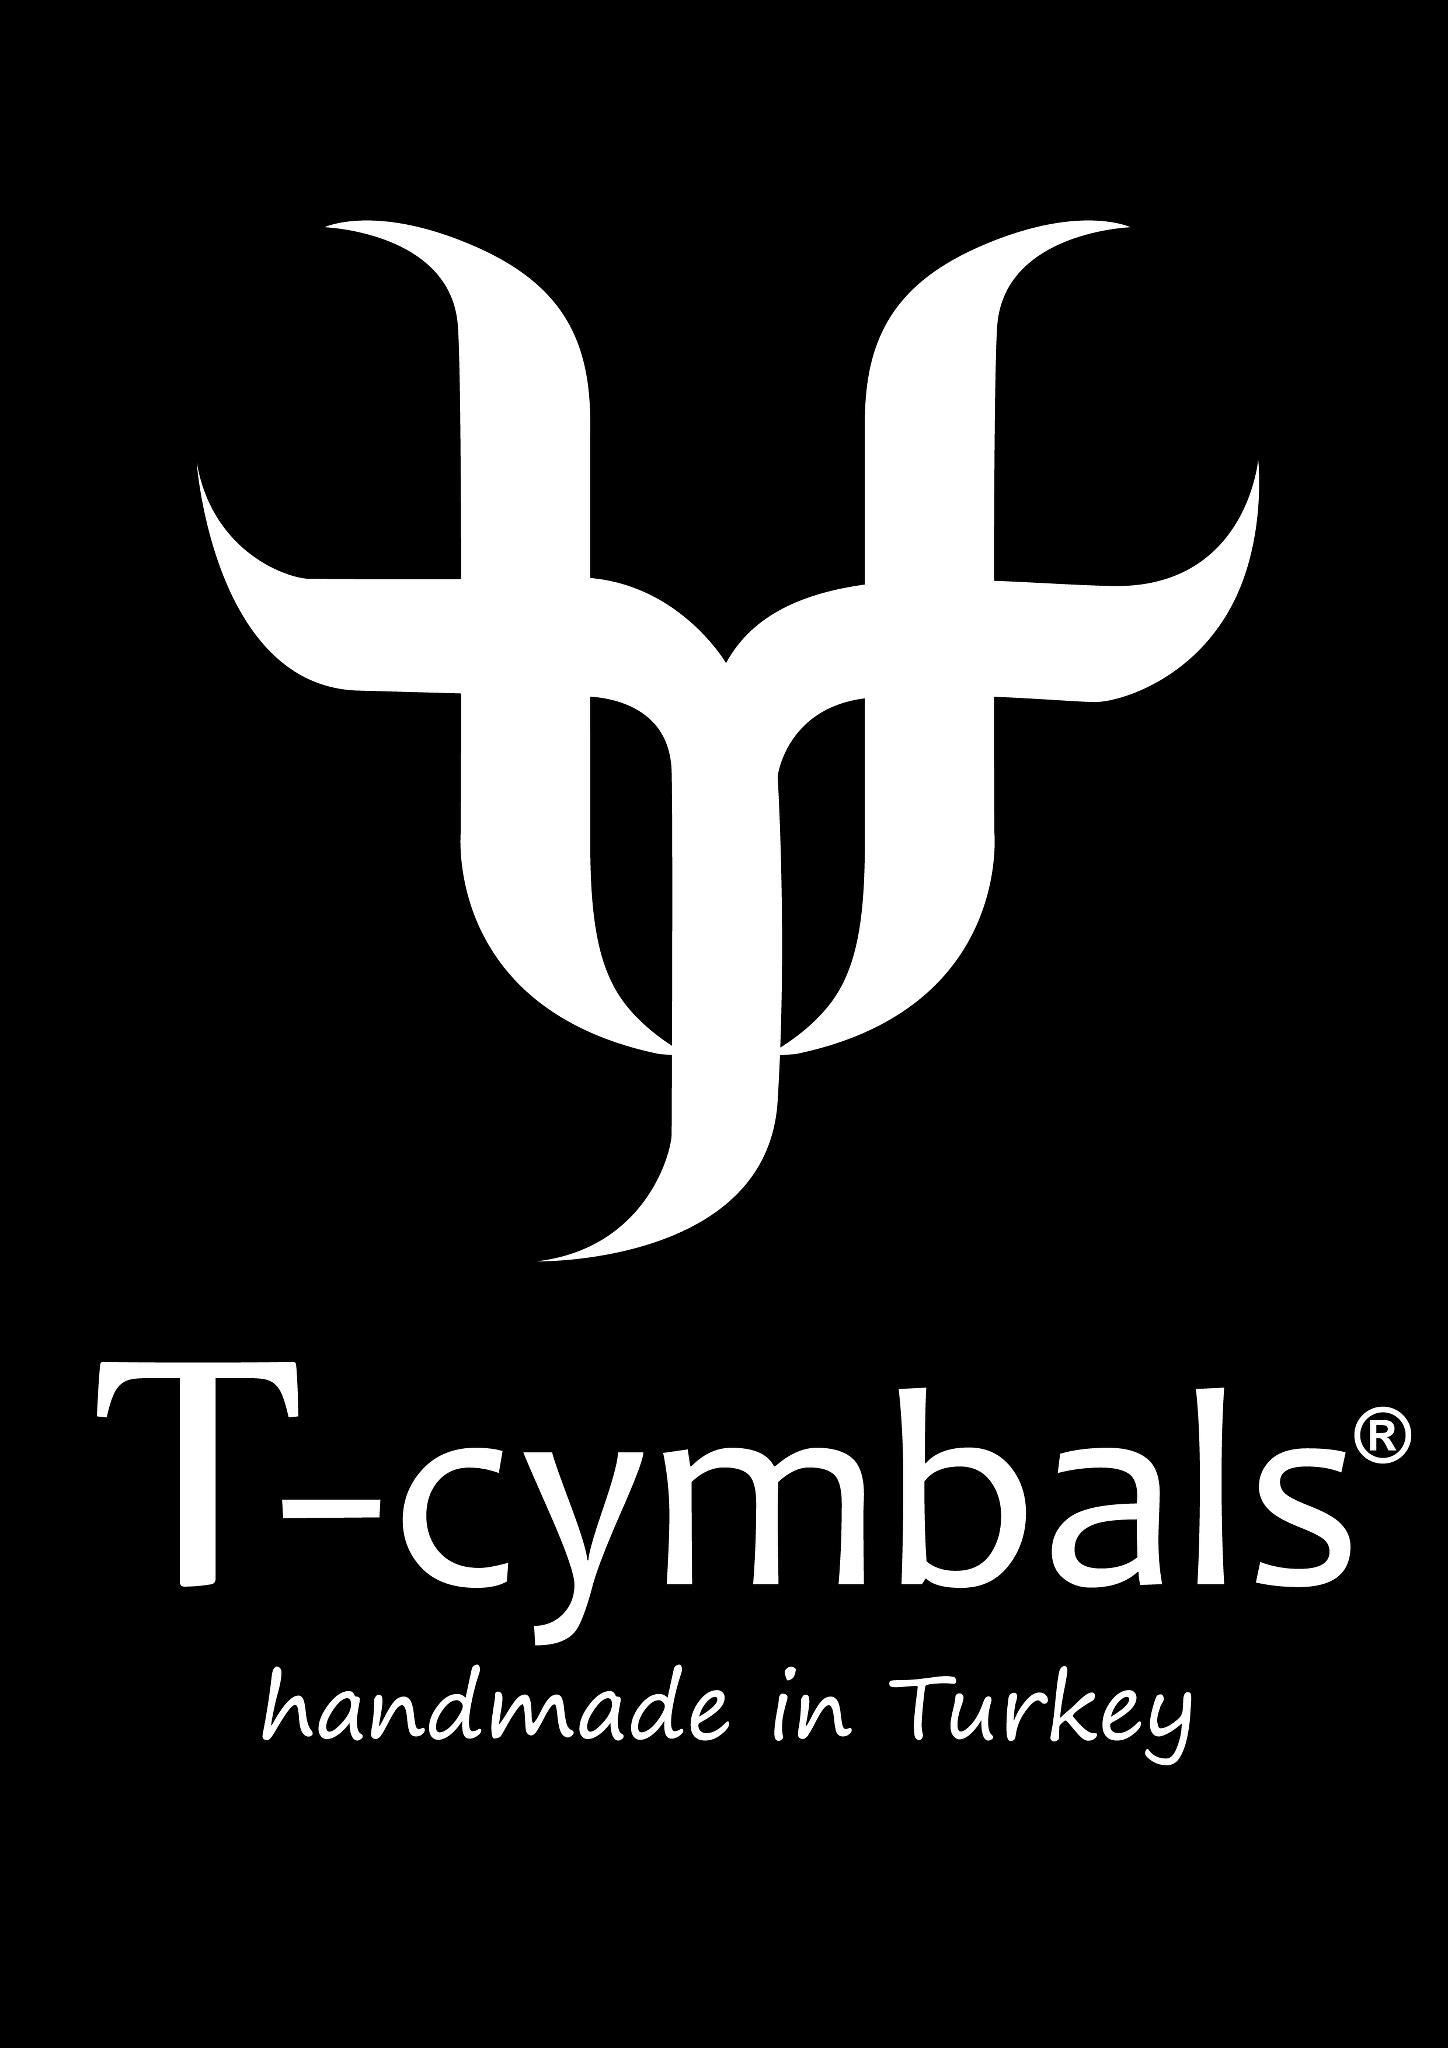 T-CYMBALS